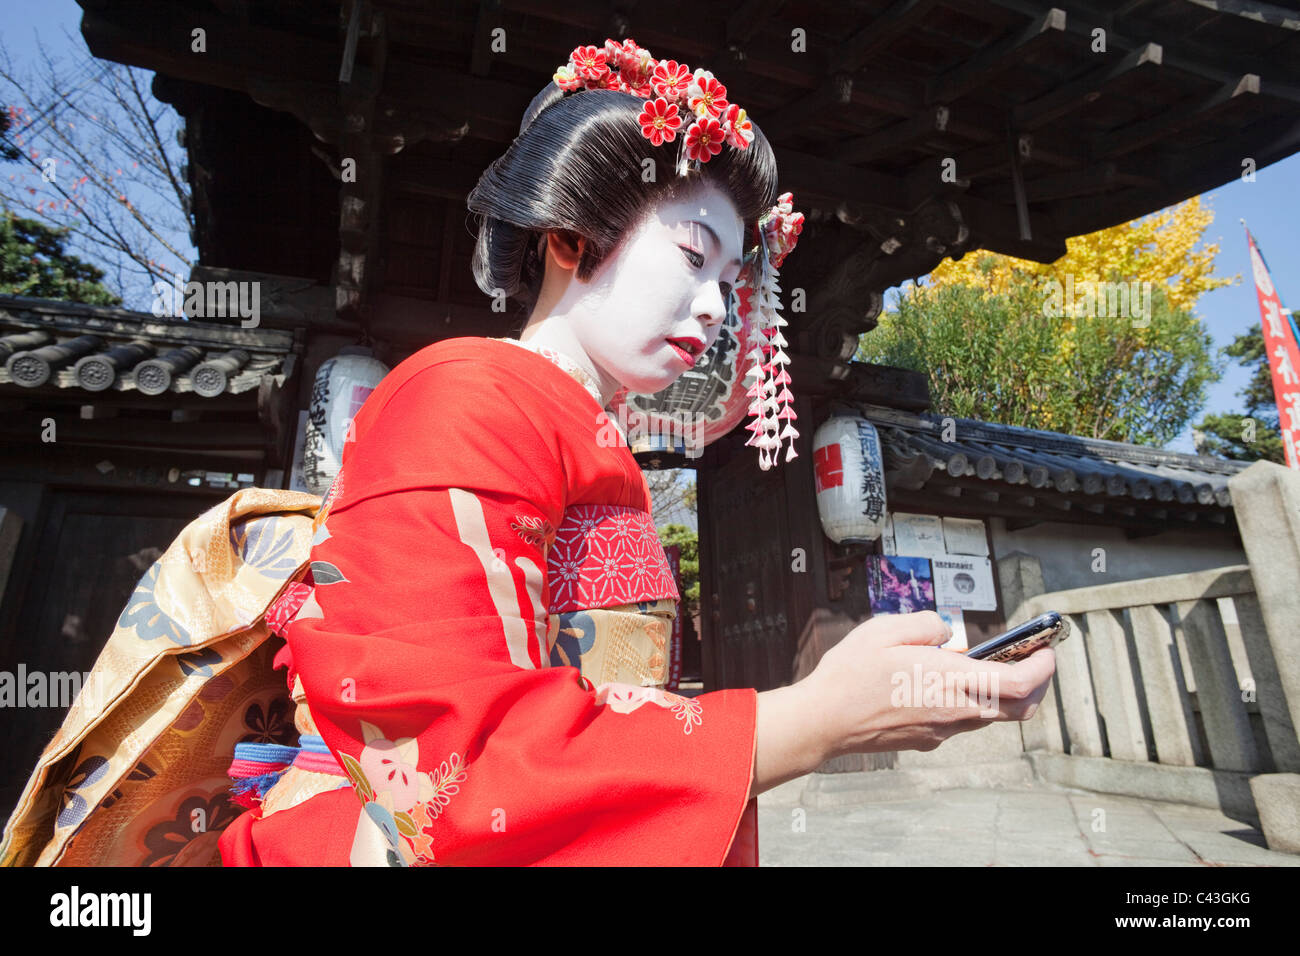 Asia, Giappone, Honshu, Kyoto, Femmina, Donna Donne, Donna Giapponese, Le donne giapponesi, donna asiatica, donne Immagini Stock